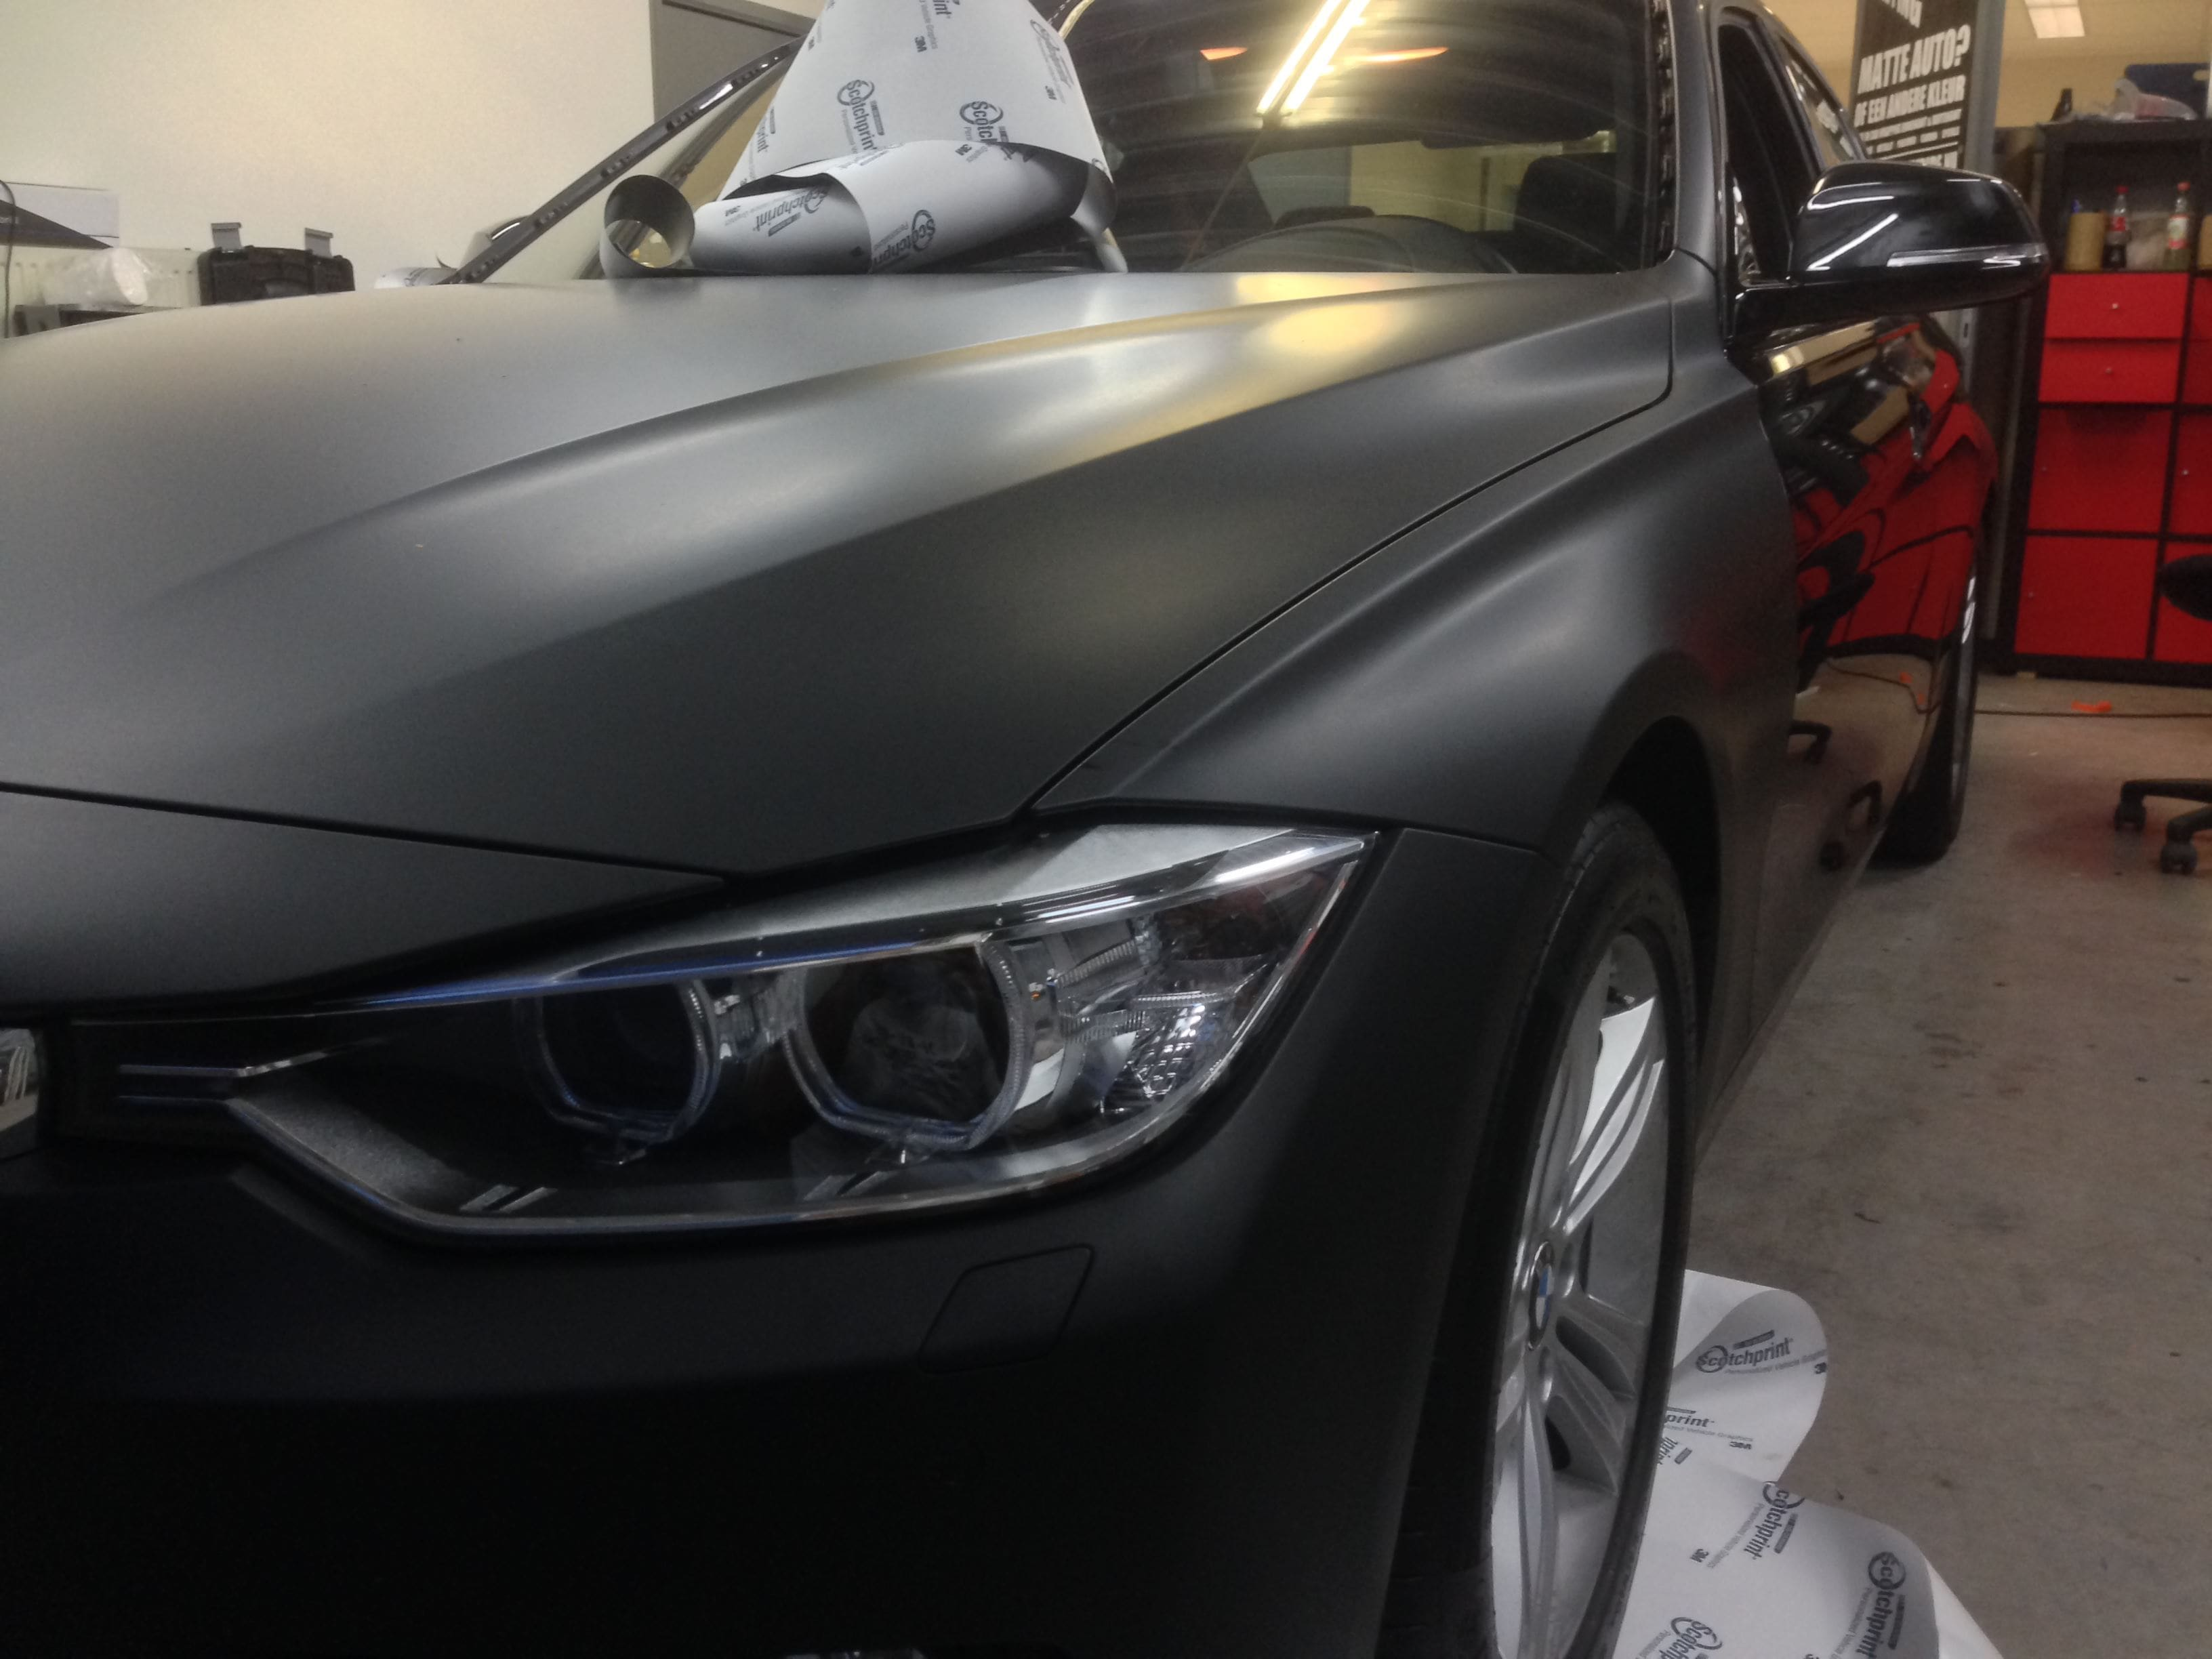 BMW E92 3 Serie met Mat Zwarte Wrap, Carwrapping door Wrapmyride.nu Foto-nr:5404, ©2021